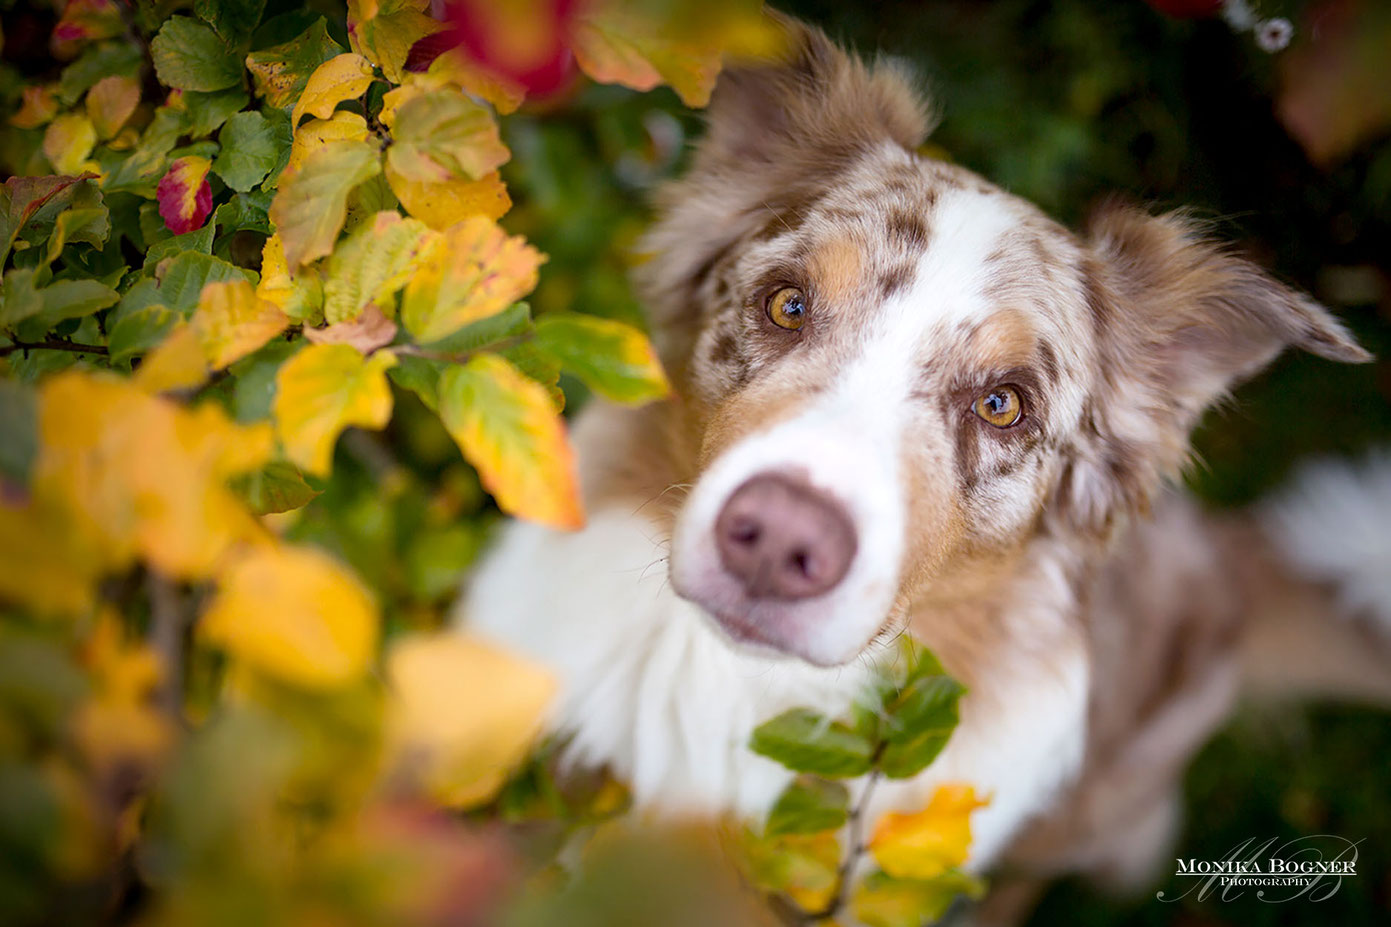 australian shepherd im Herbstlaub, Sigma 35mm